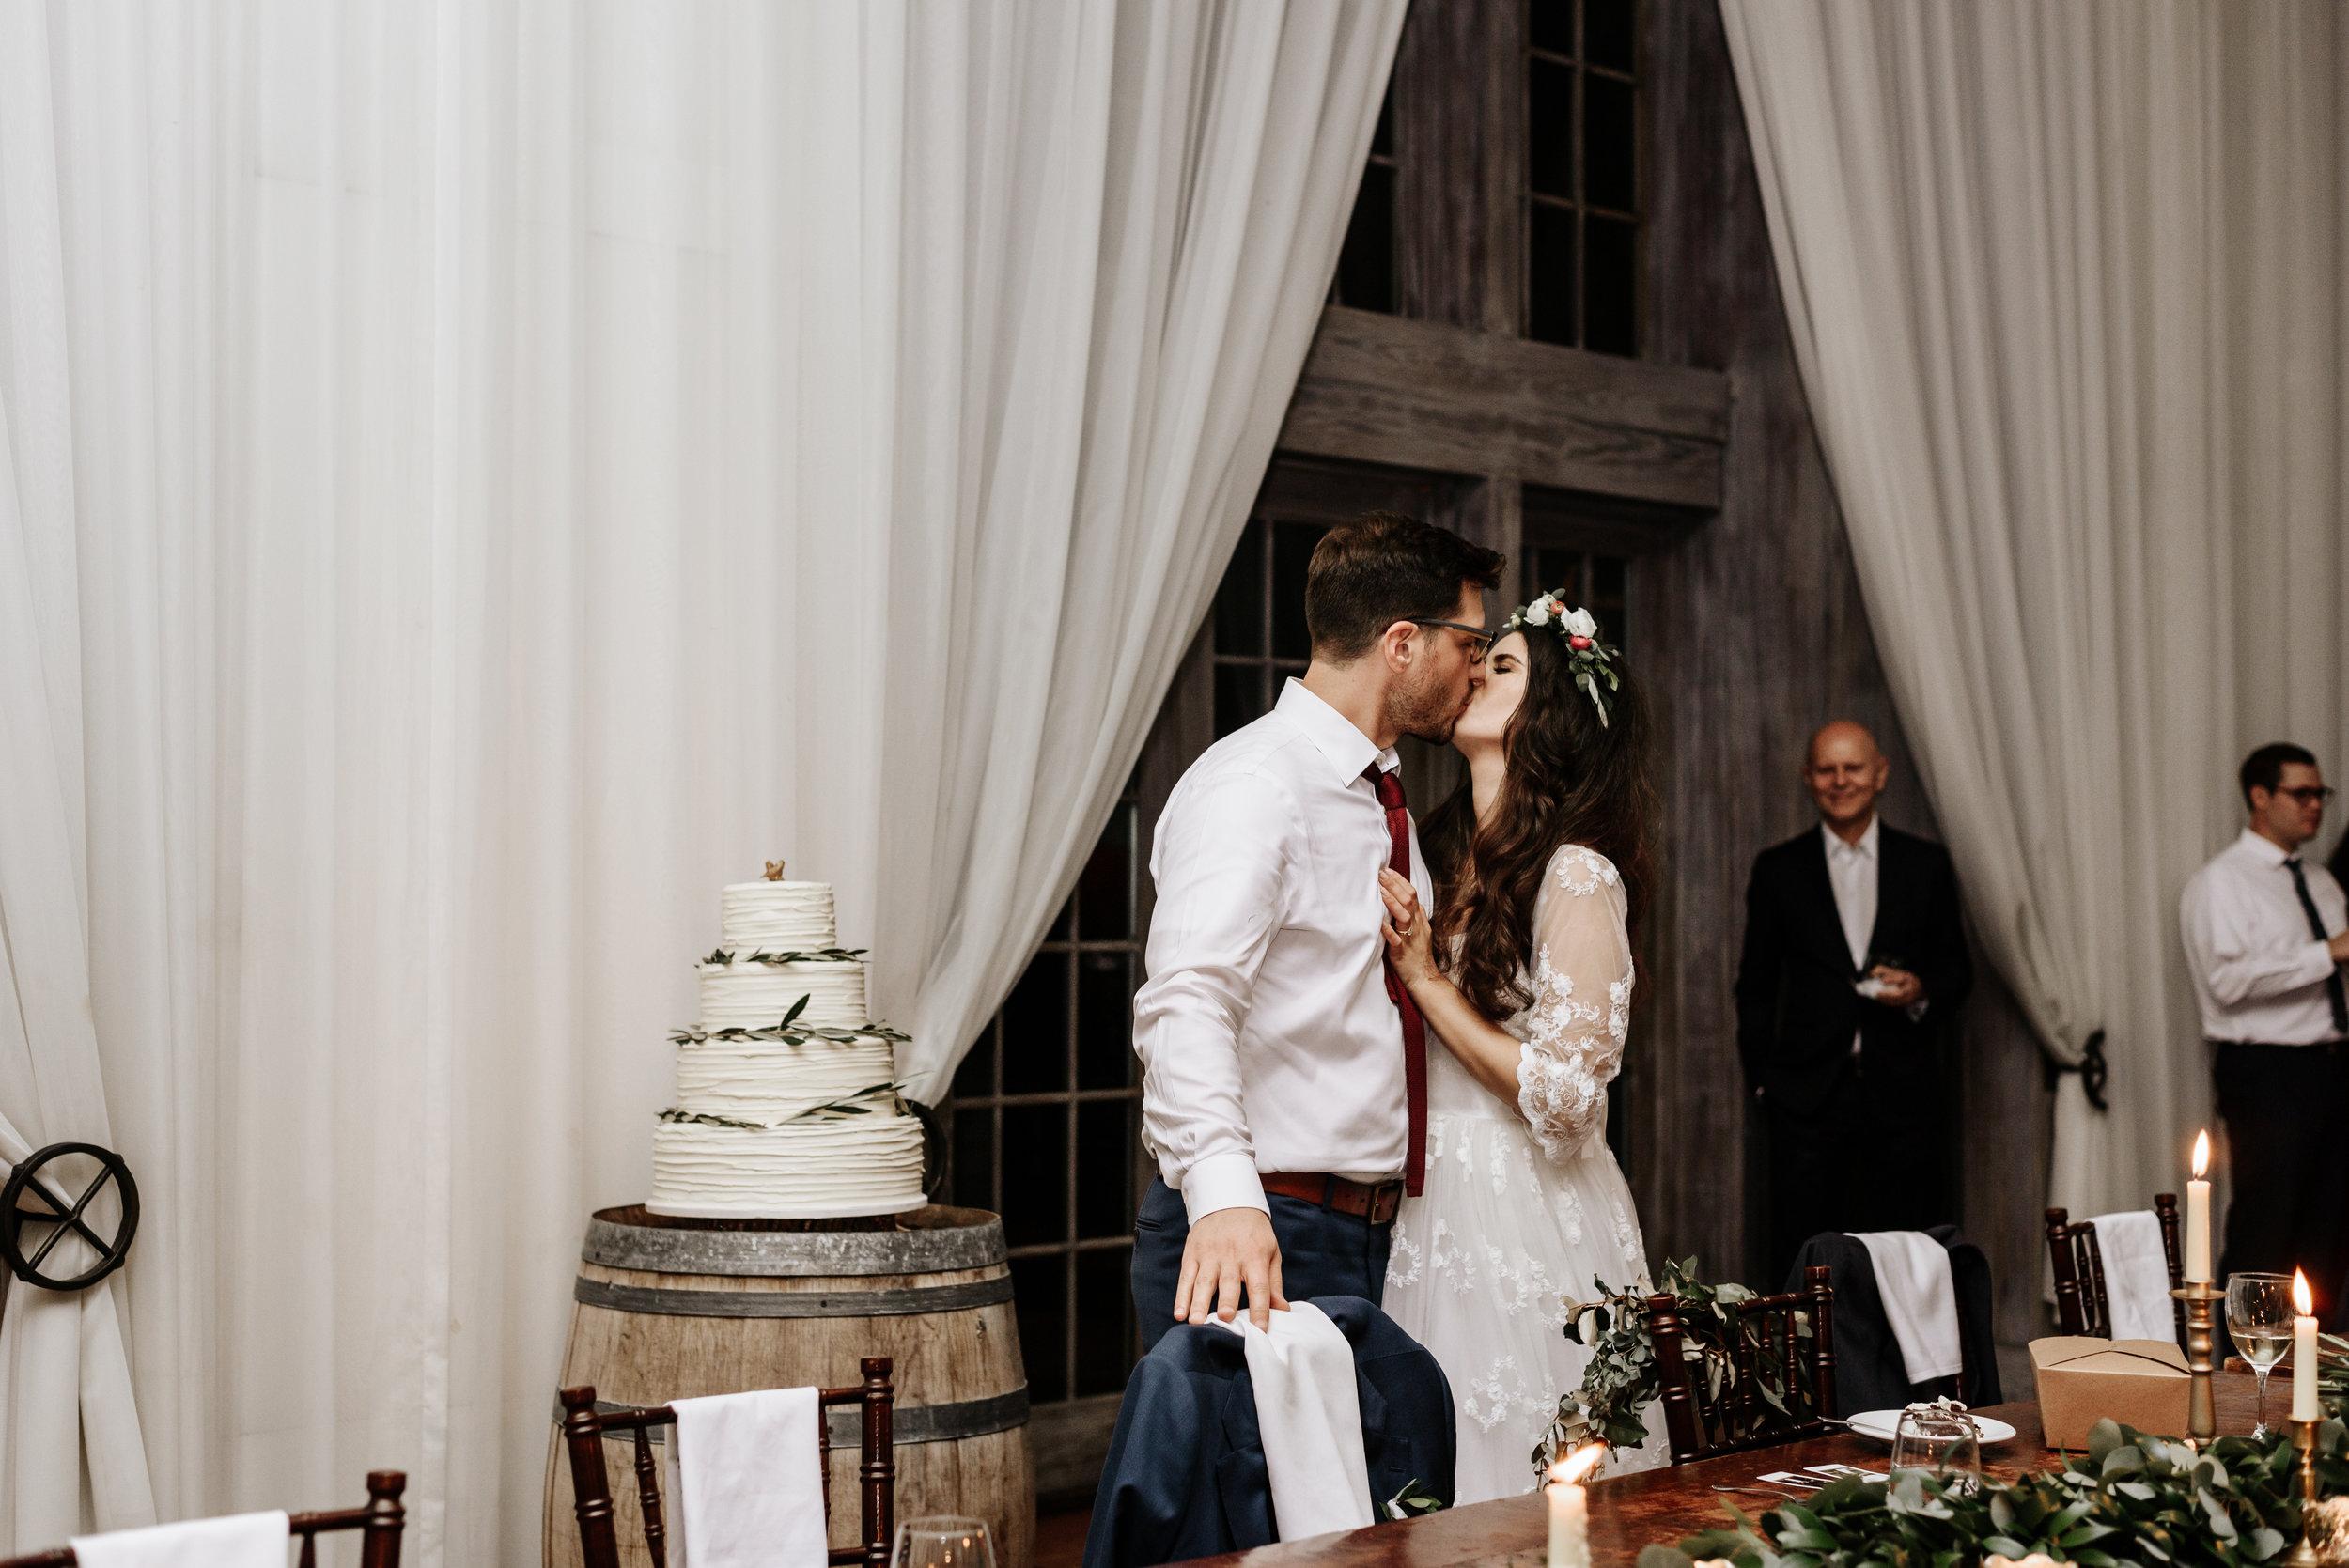 Veritas-Vineyards-and-Winery-Wedding-Photography-Afton-Virginia-Yasmin-Seth-Photography-by-V-3514.jpg